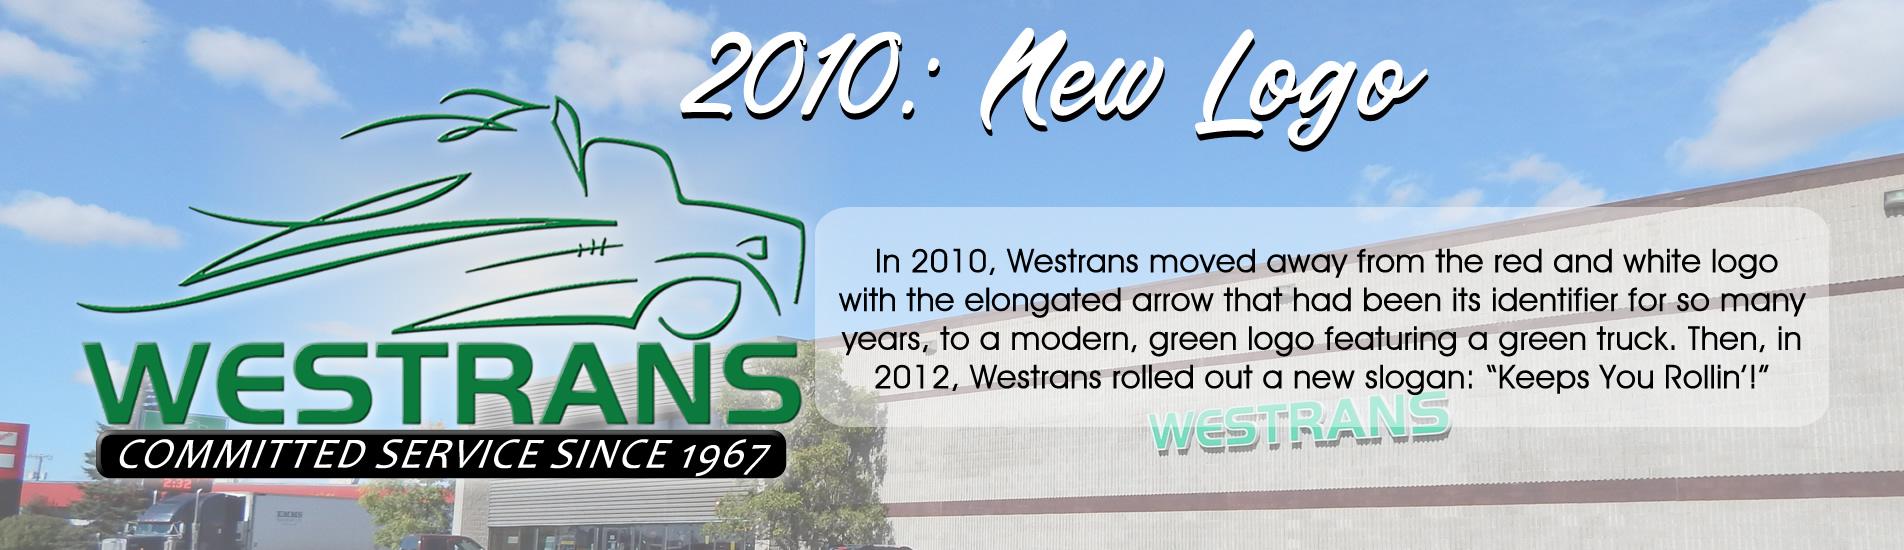 westrans-new-logo-2010